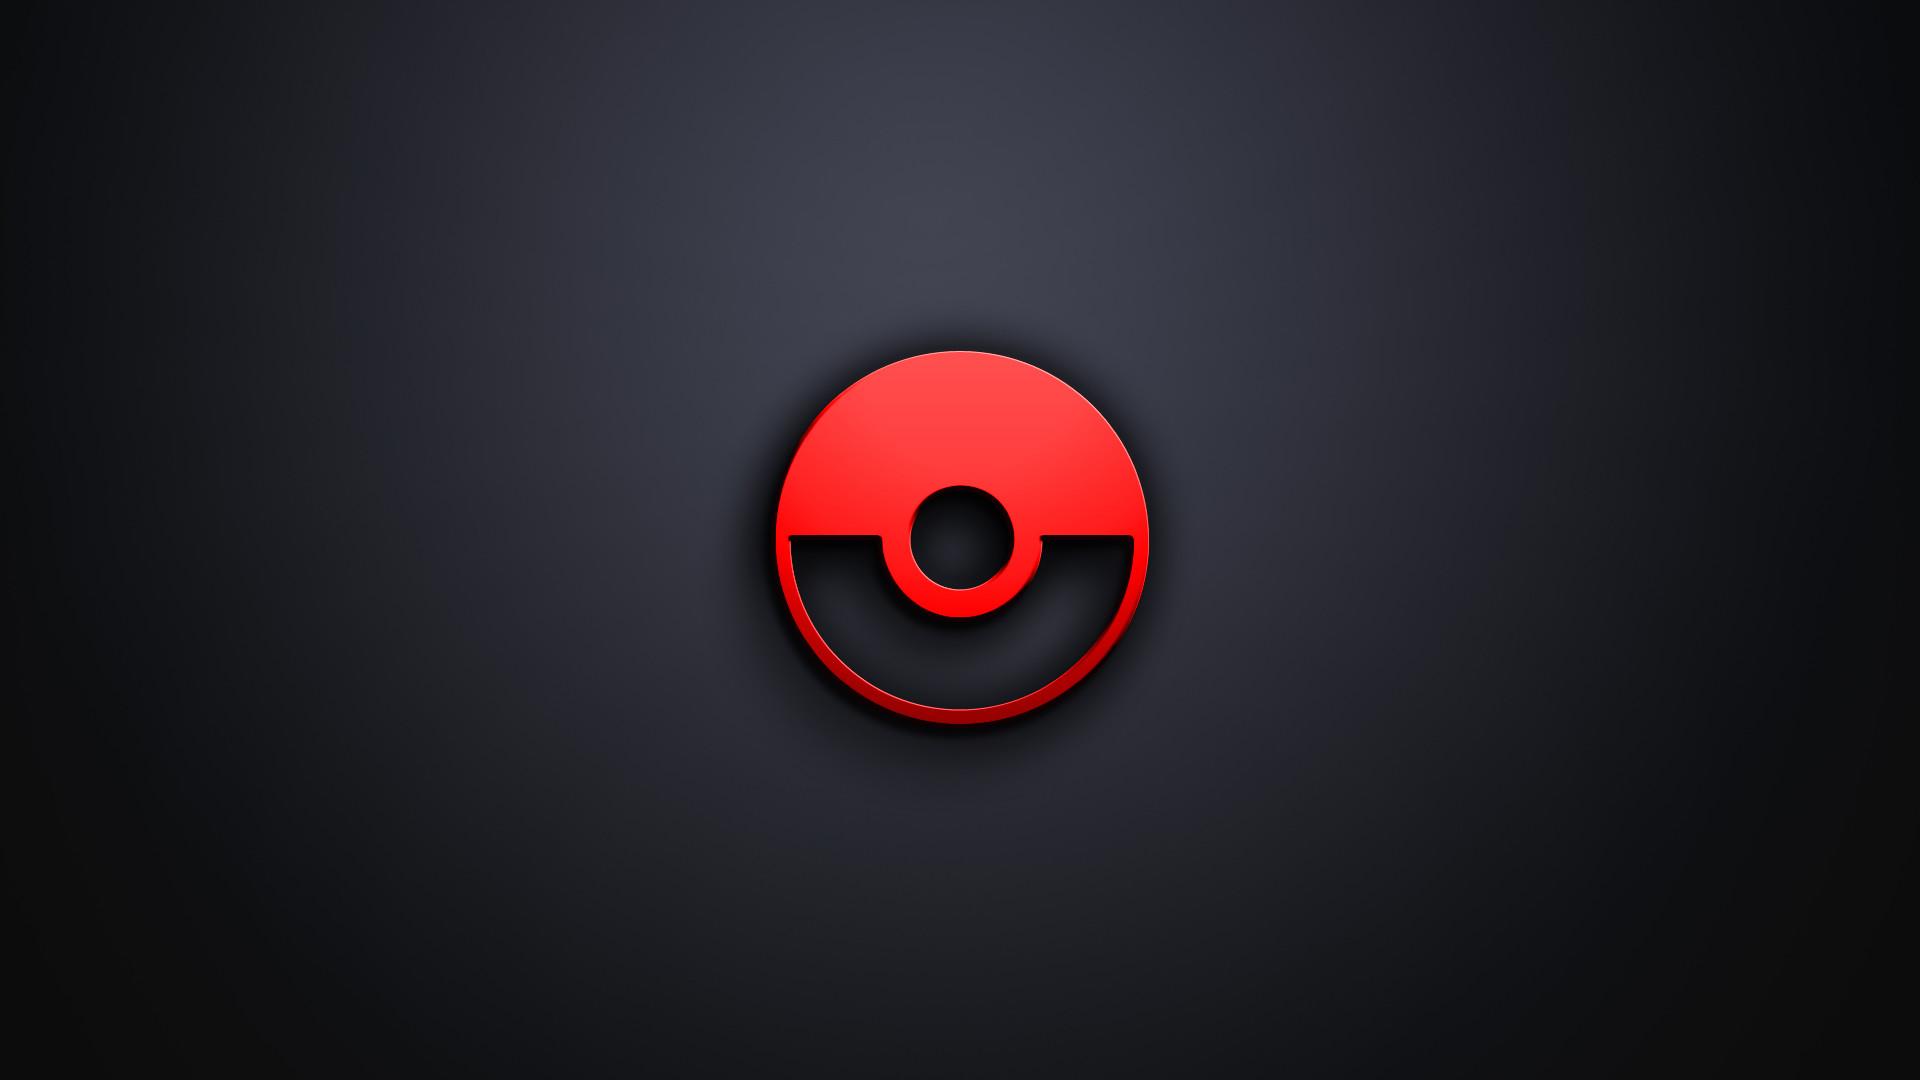 Res: 1920x1080, Pokeball Desktop Pokemon Ball Wallpaper Hd For Mobile Phones Pics